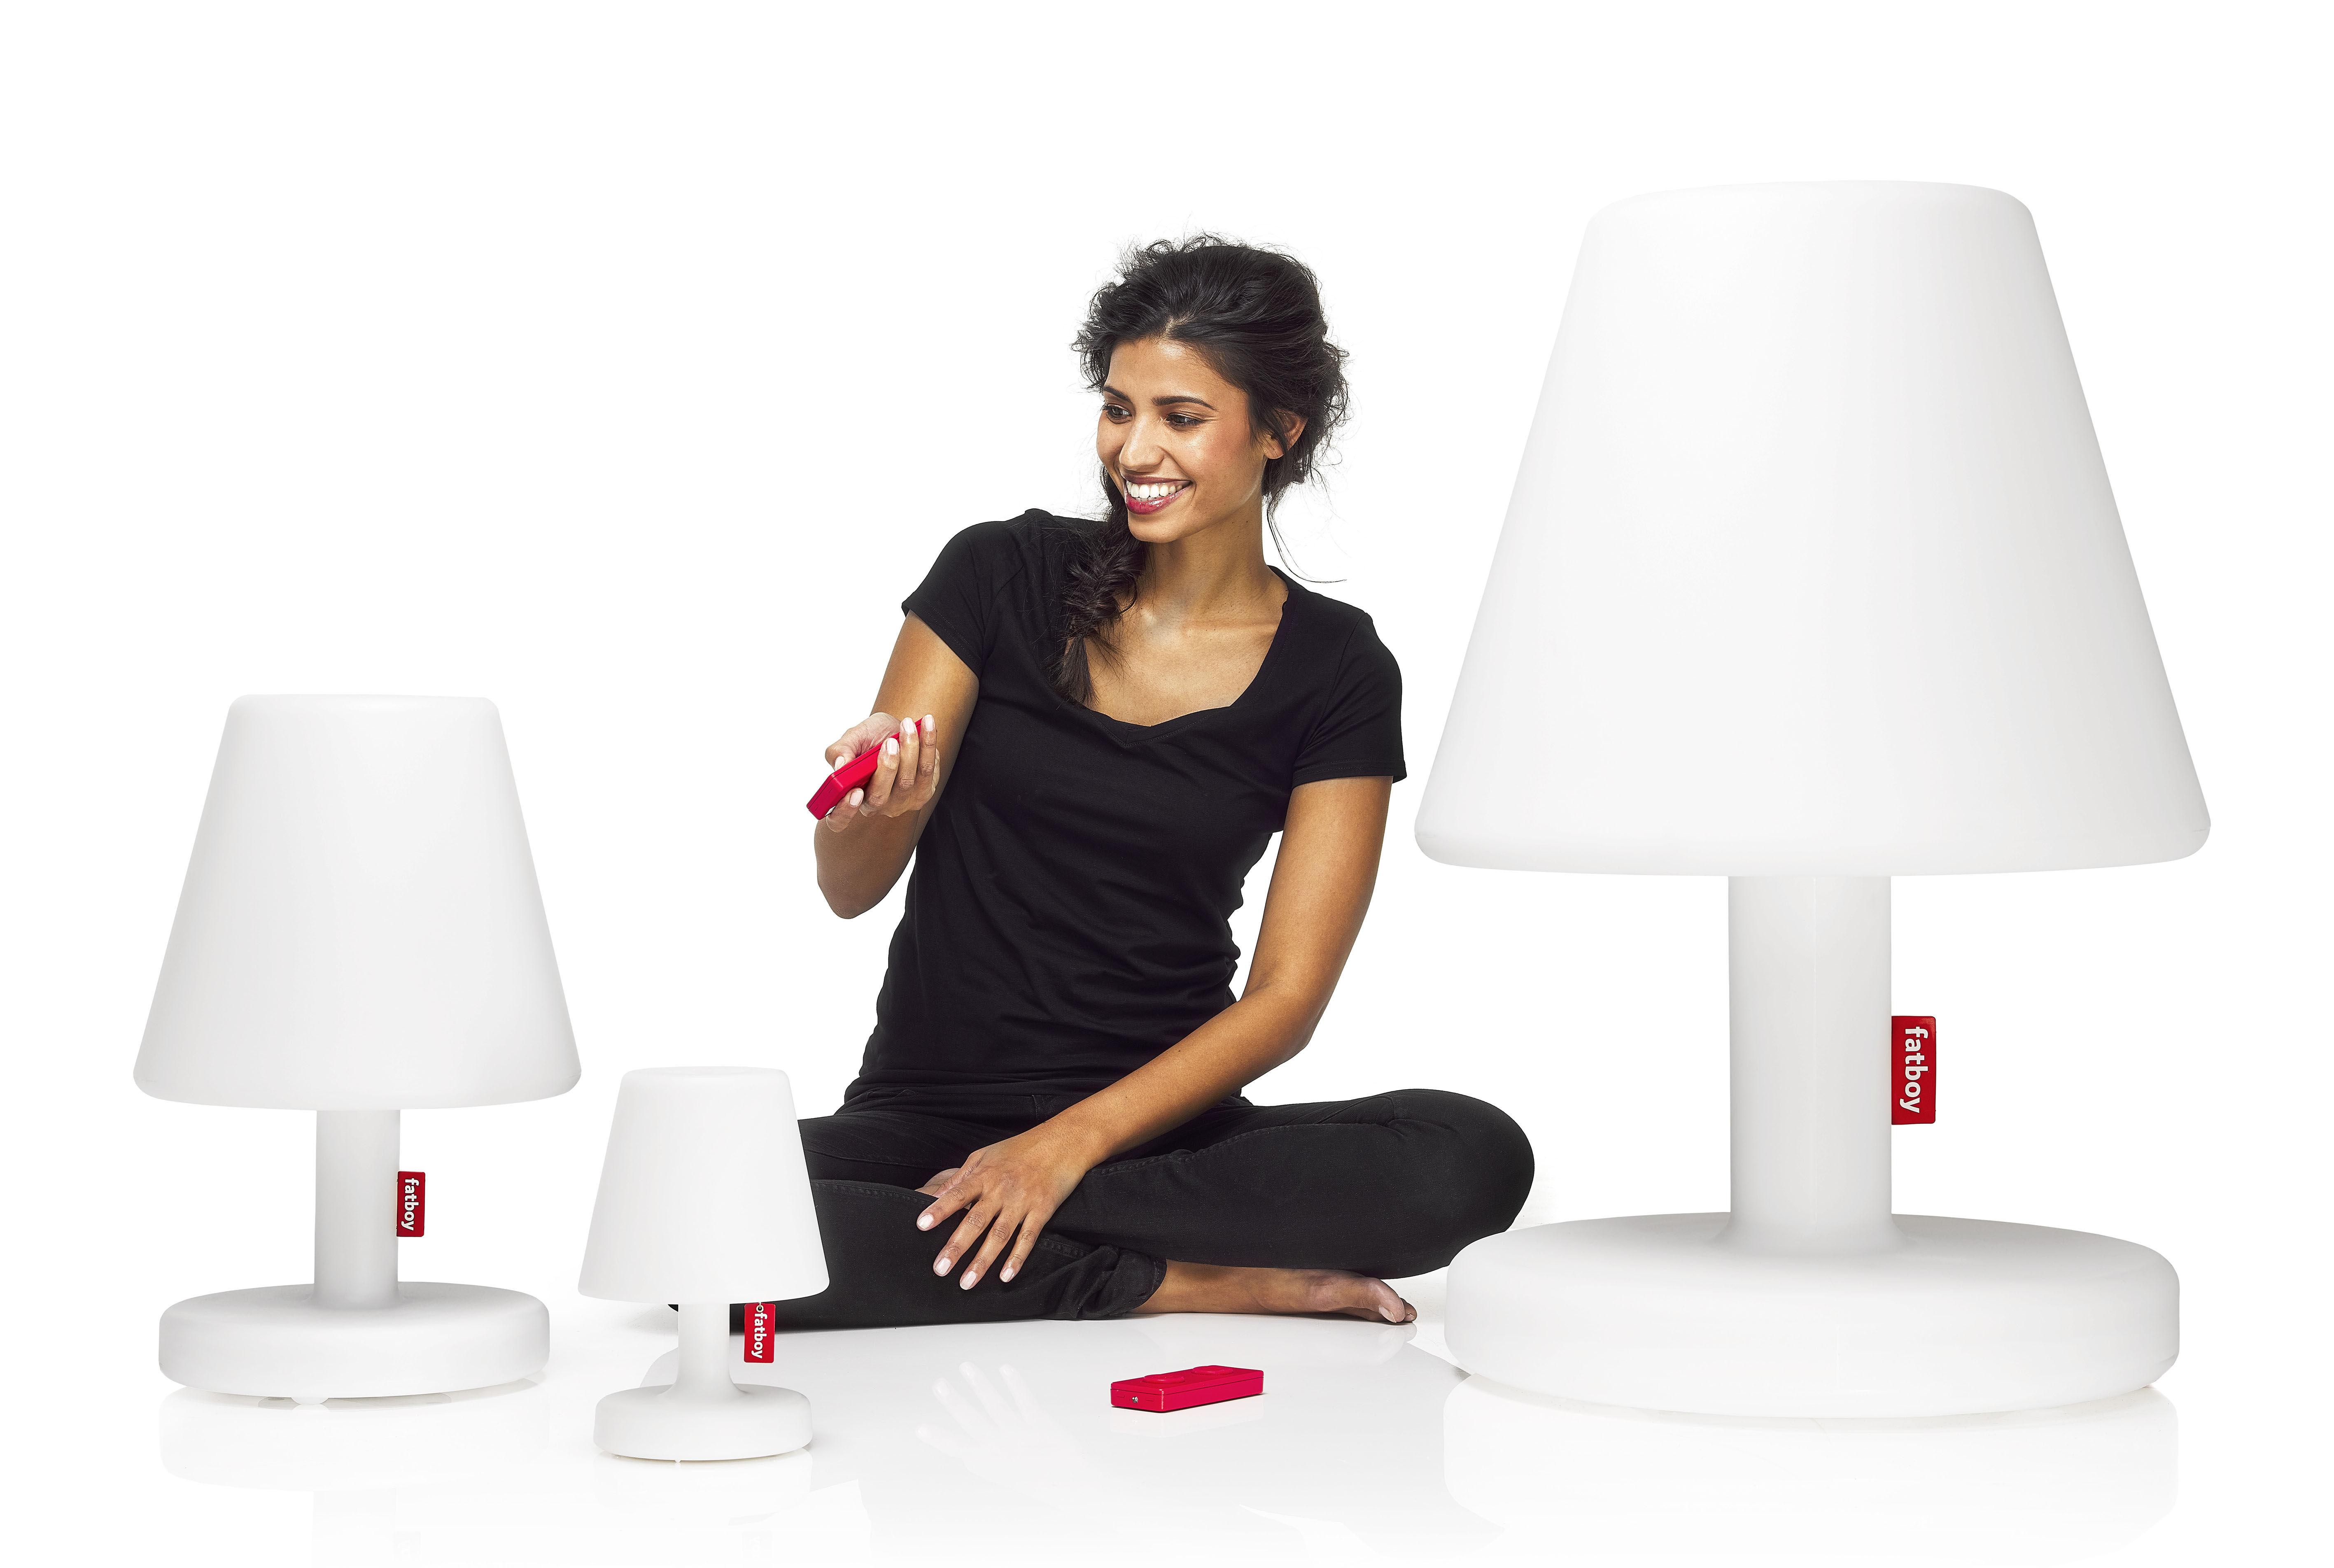 lampe de sol edison the grand ii h 90 cm led blanc fatboy made in design. Black Bedroom Furniture Sets. Home Design Ideas